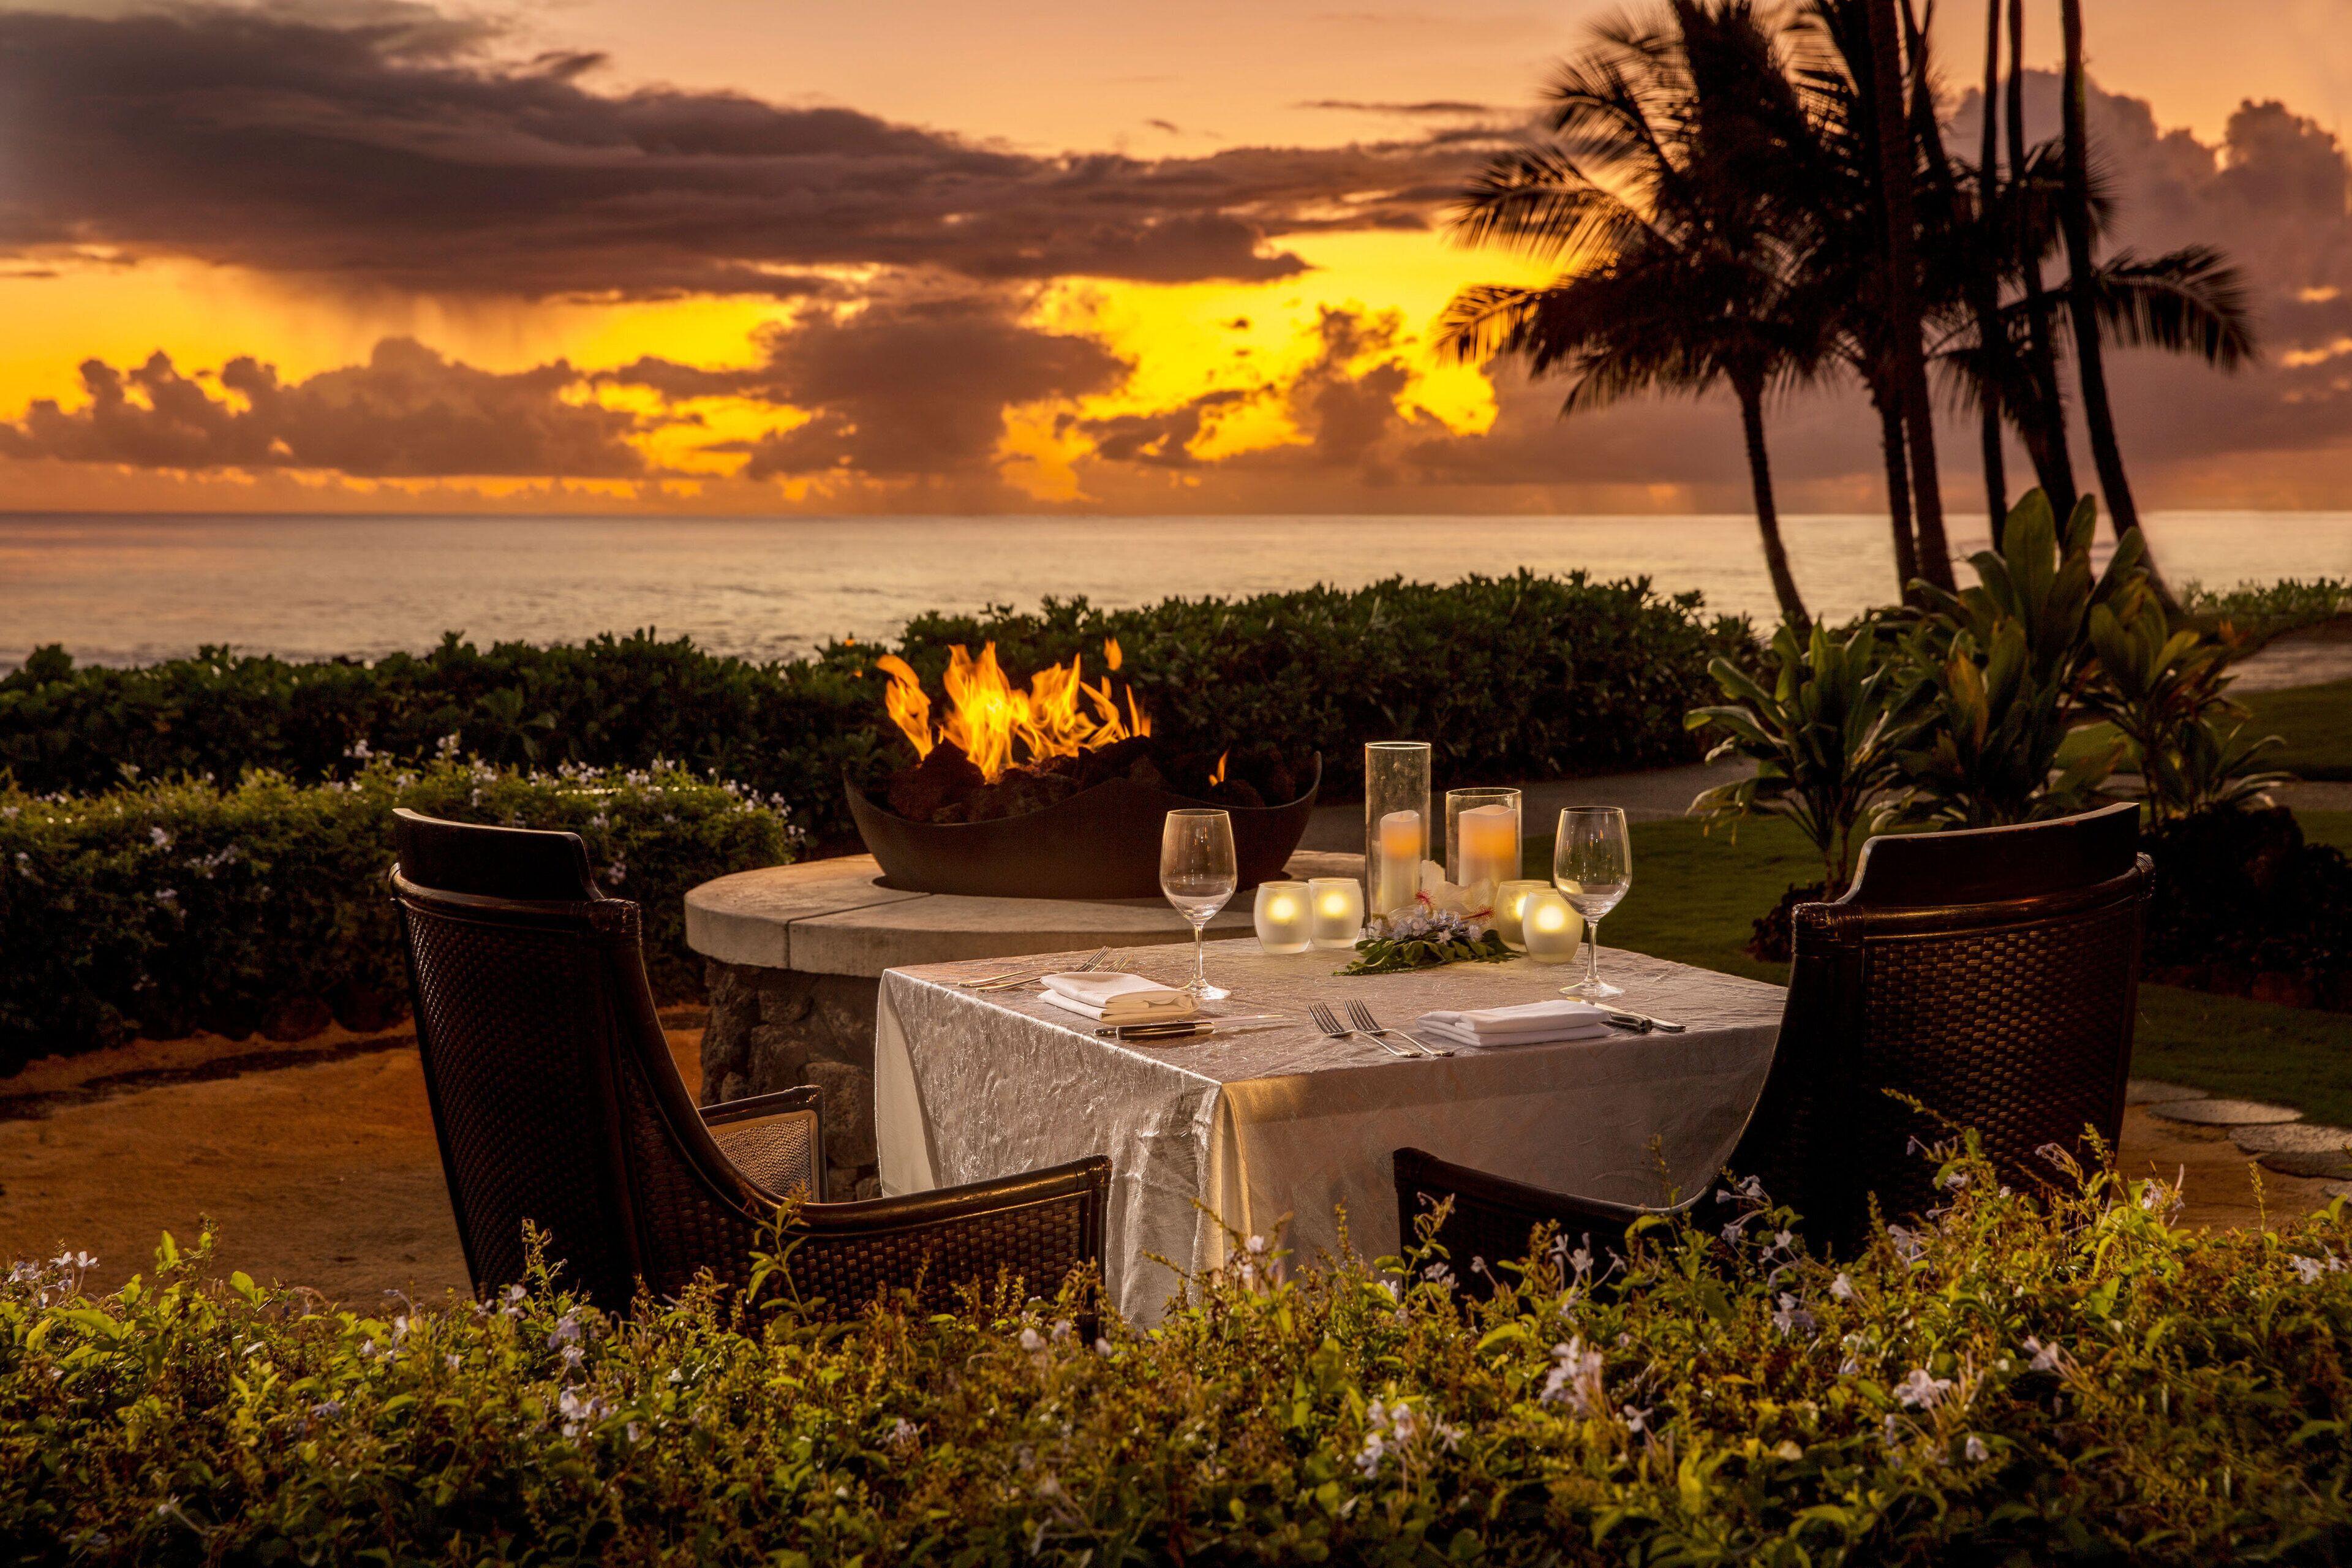 Courtesy of Sheraton Kauai Resort Villas / Expedia.com